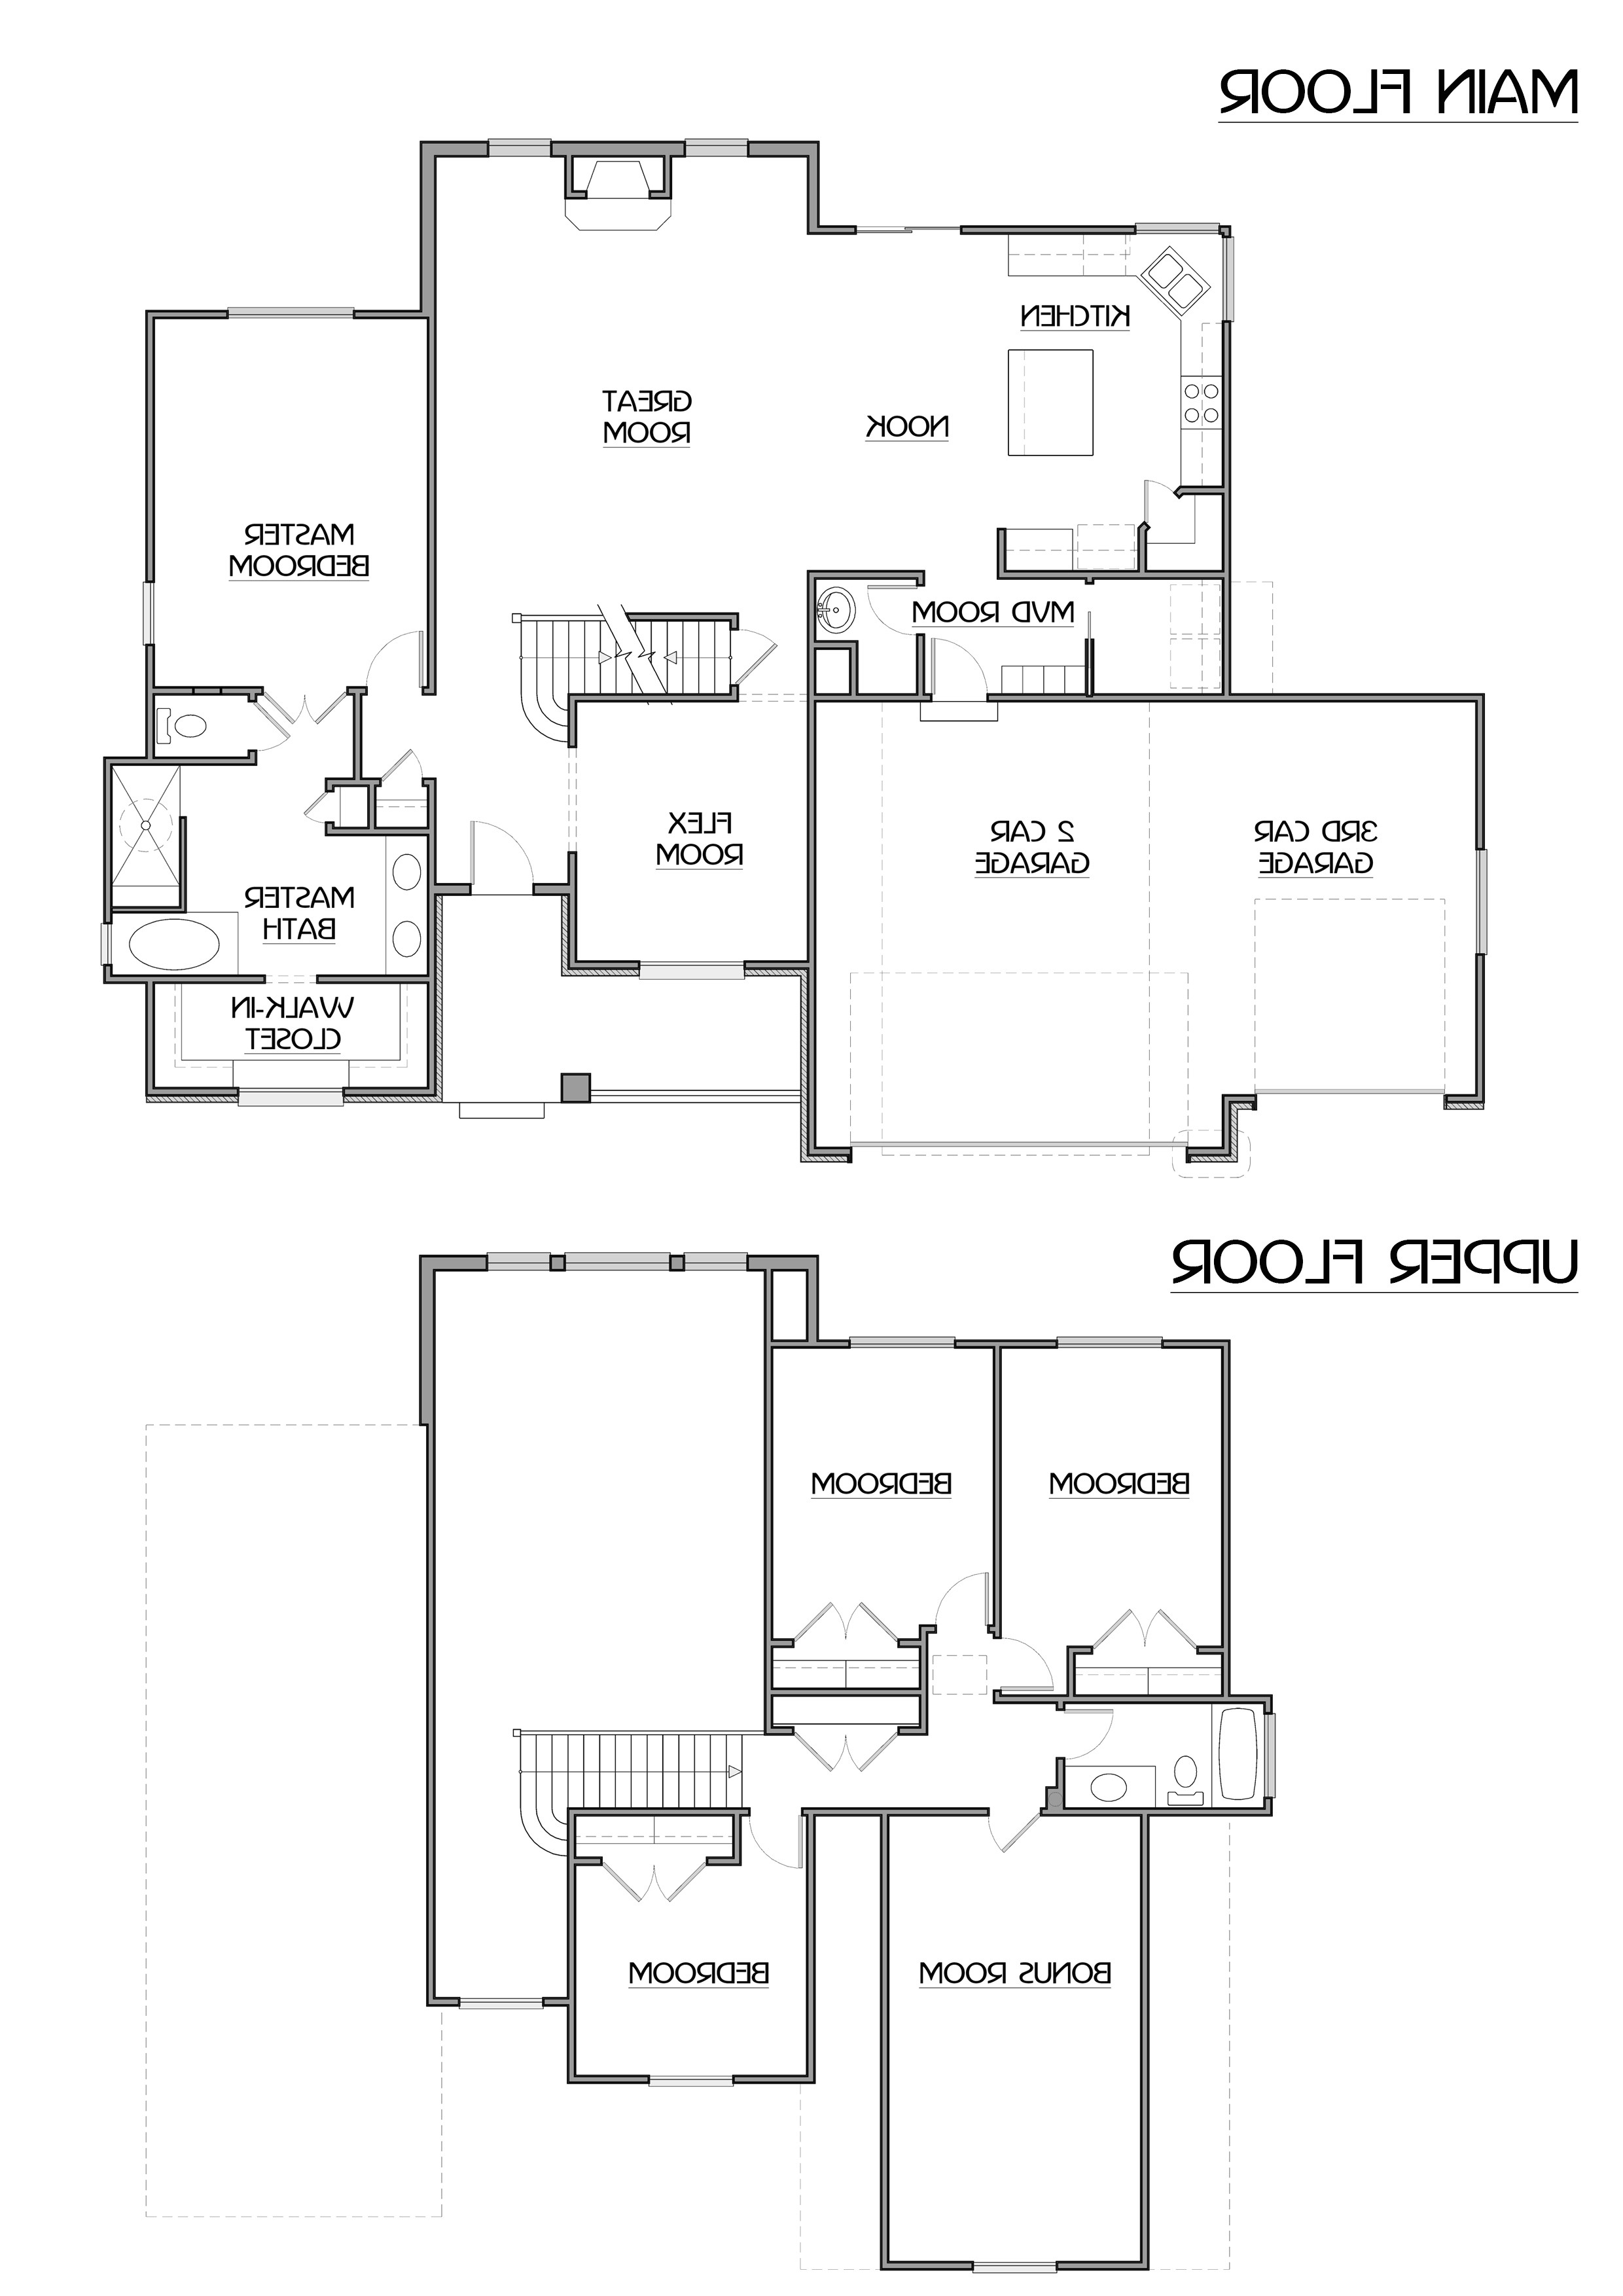 1 story house plans with bonus room